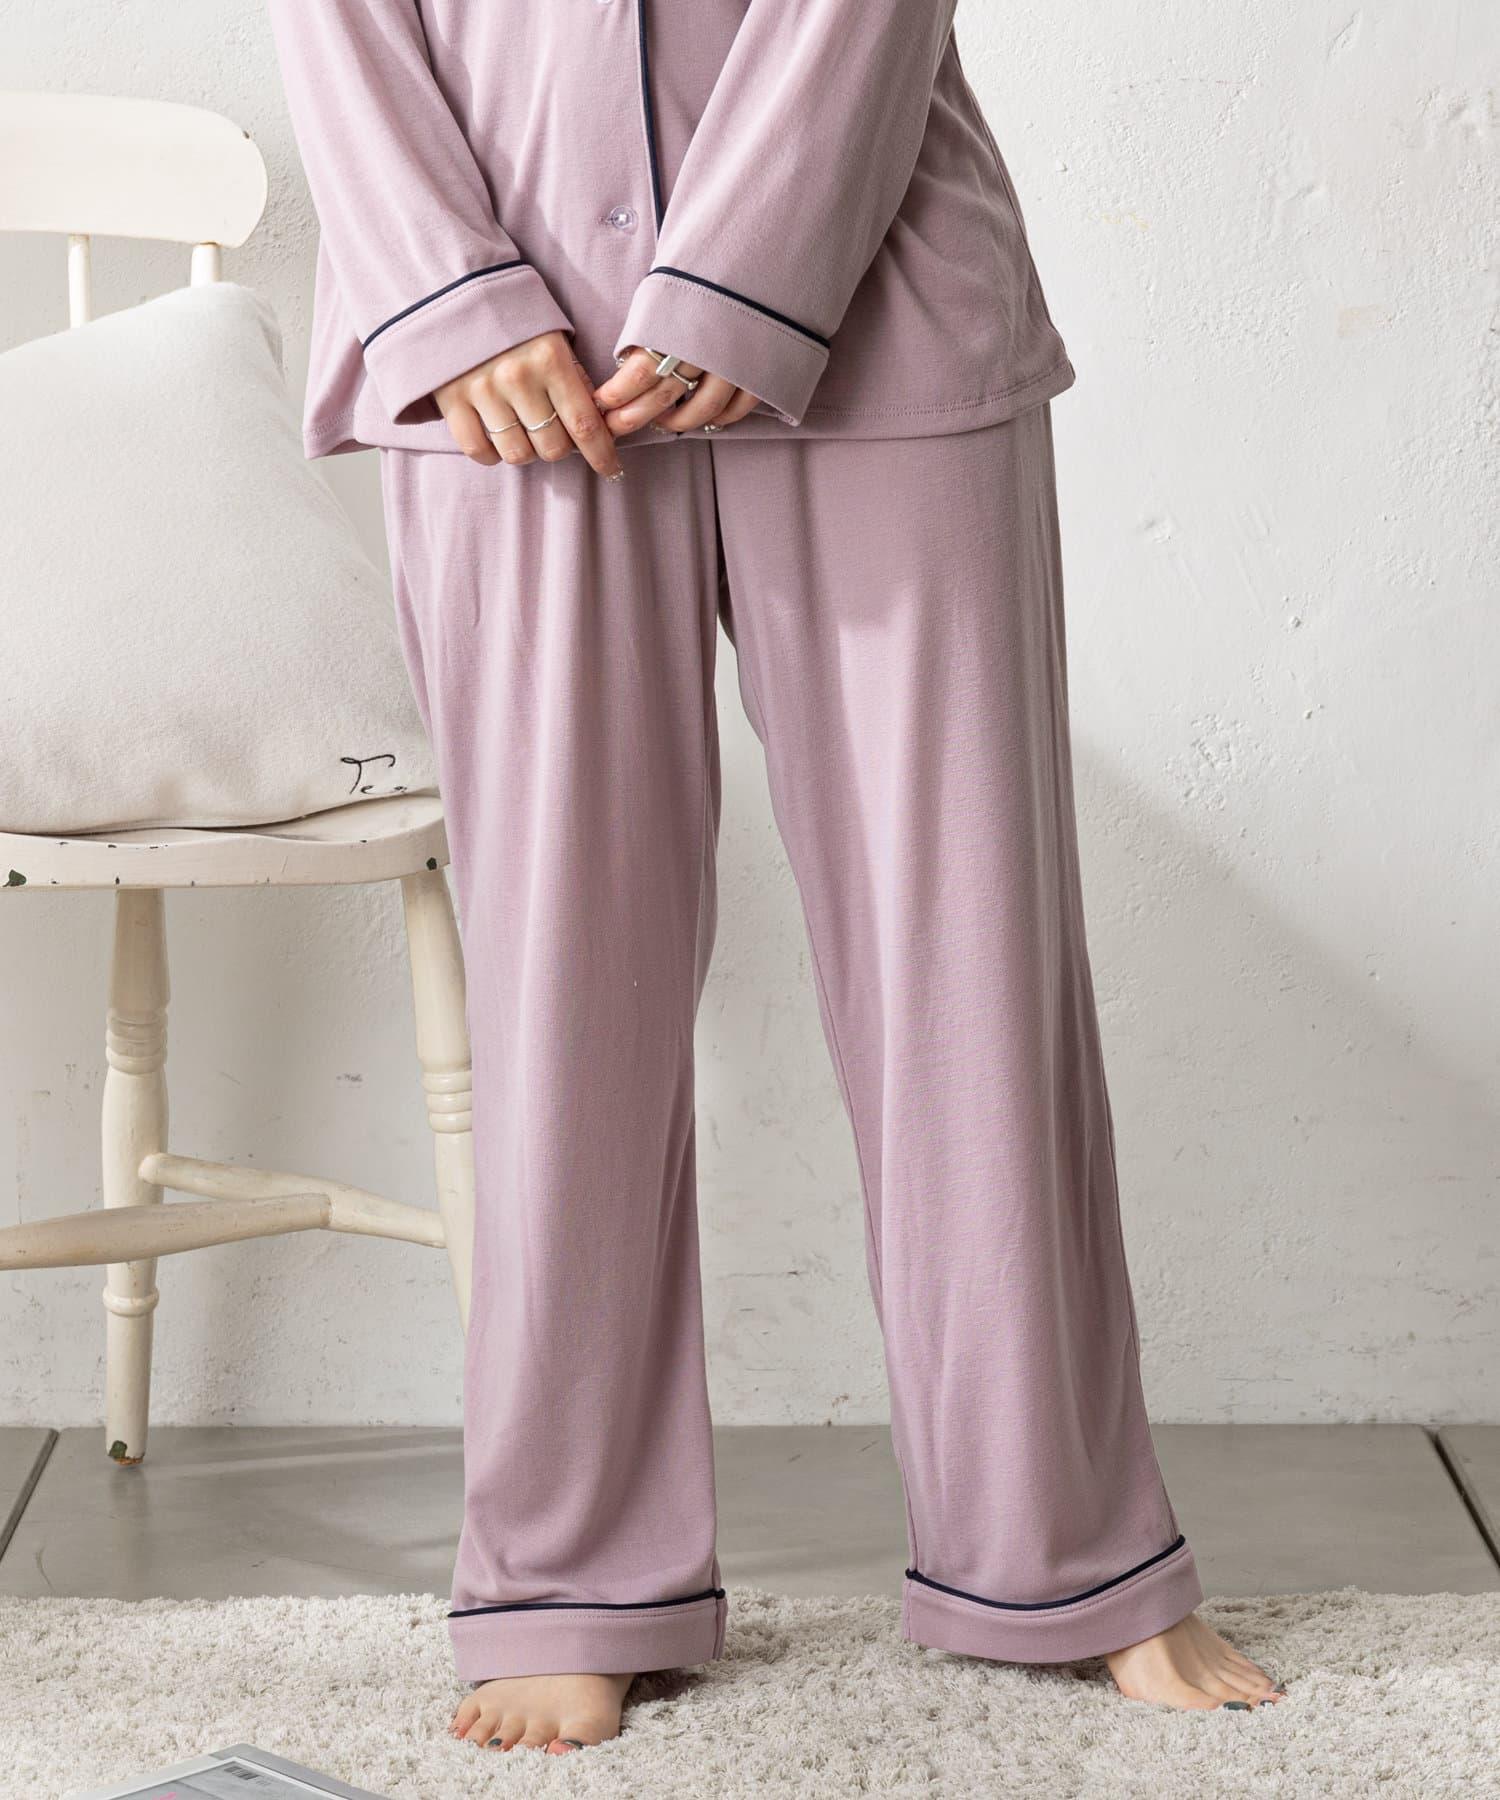 TERRITOIRE(テリトワール) 【ふんわりやわらか】ふんわり快眠パジャマ 上下セット